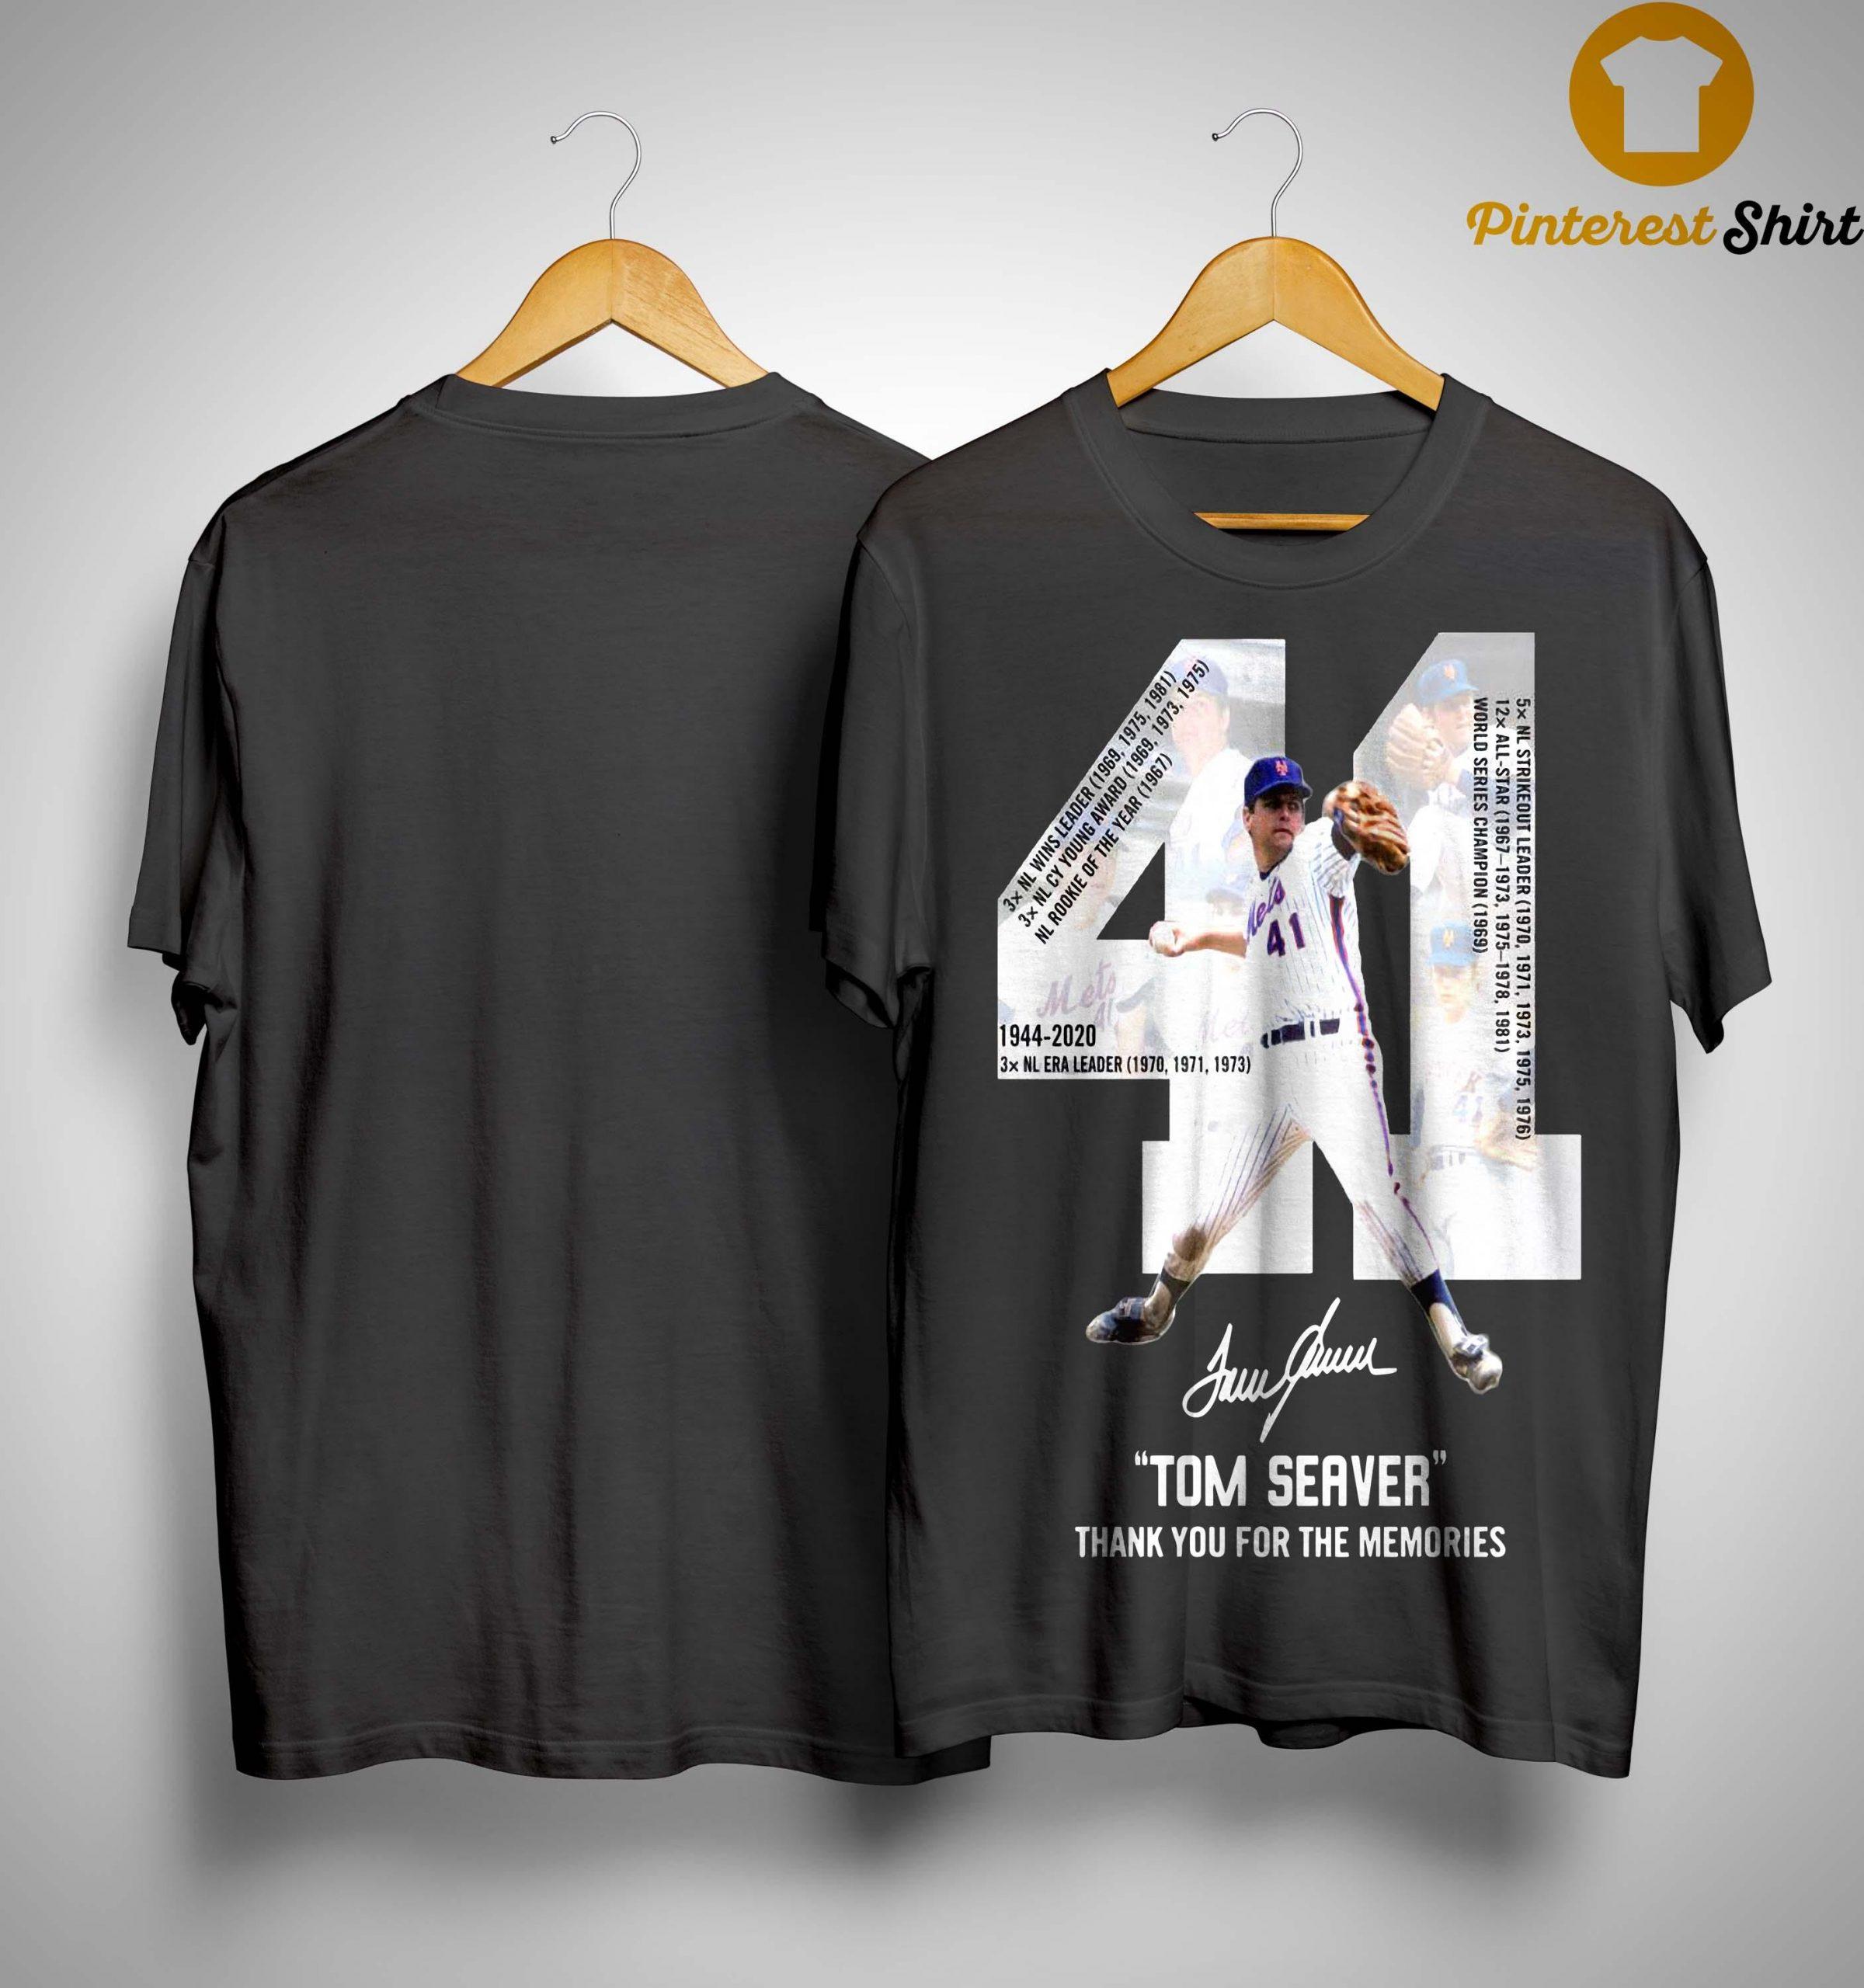 41 Tom Seaver Signature Thank You For The Memories Shirt